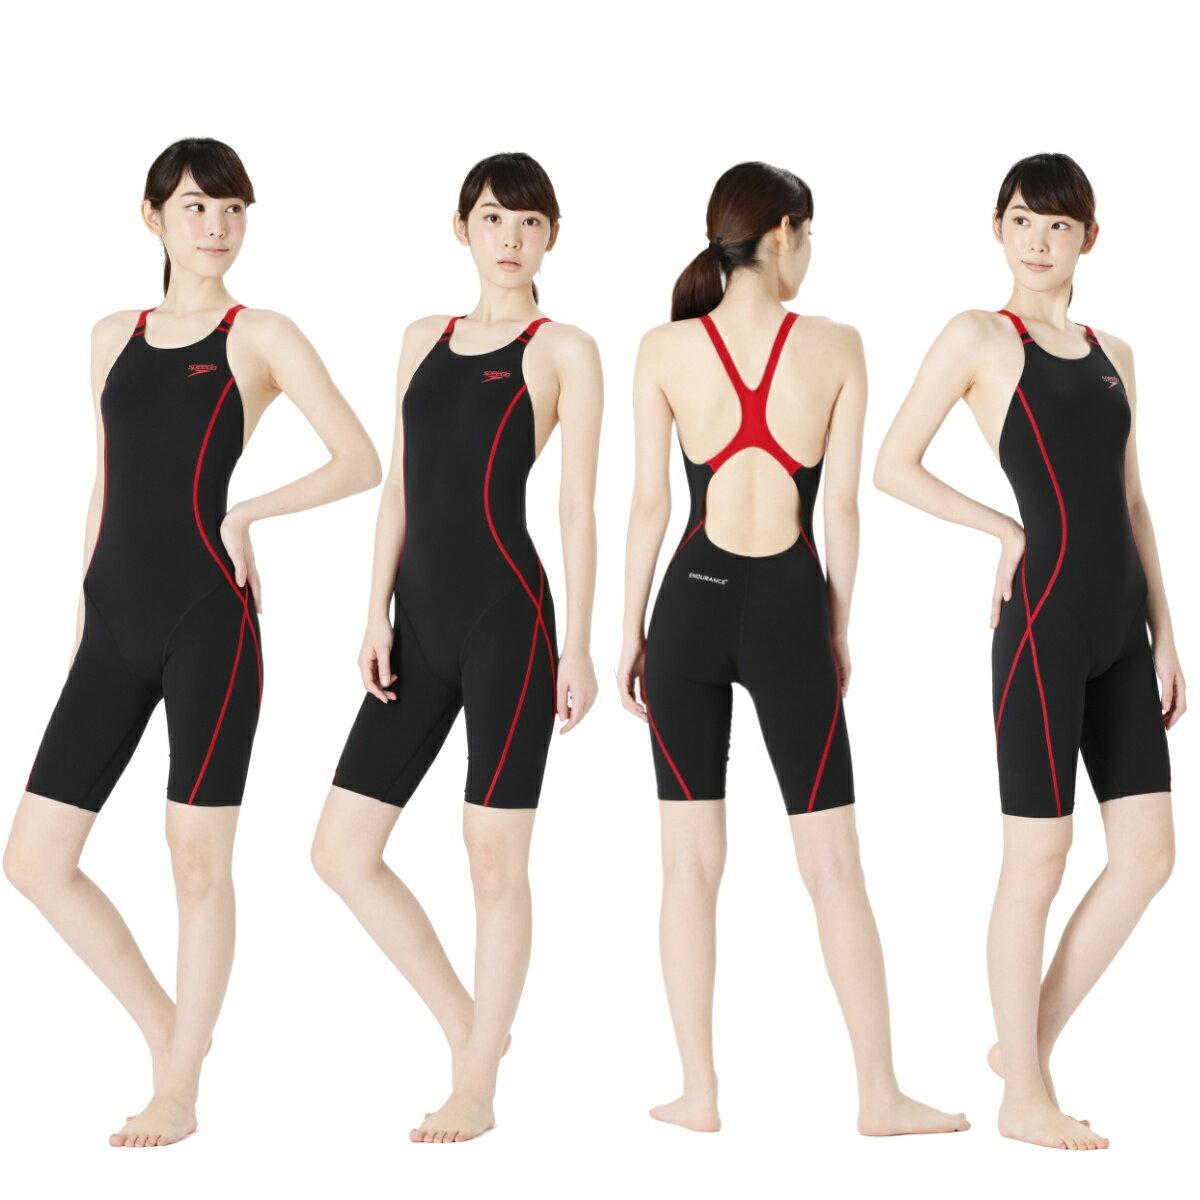 【SD56N01】SPEEDO(スピード)レディース競泳練習水着ENDURANCEJウイメンズスパッツスーツ[競泳水着/女性用/練習用/ワンピース/長持ち]